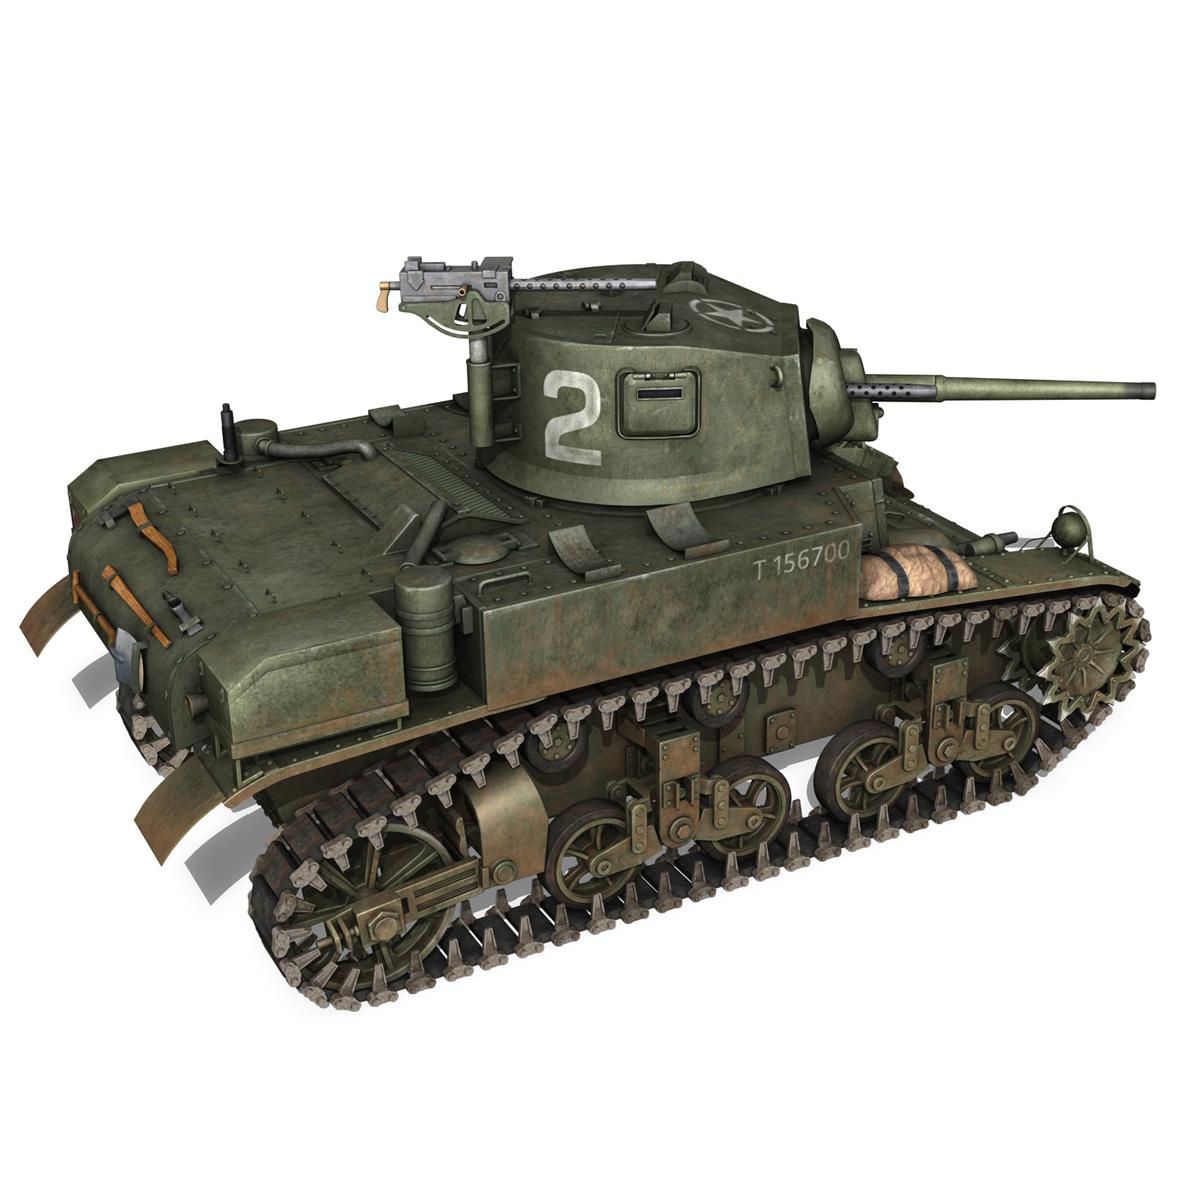 m3a1 light tank stuart – 156700 3d model c4d fbx lwo lw lws obj 3ds 265341